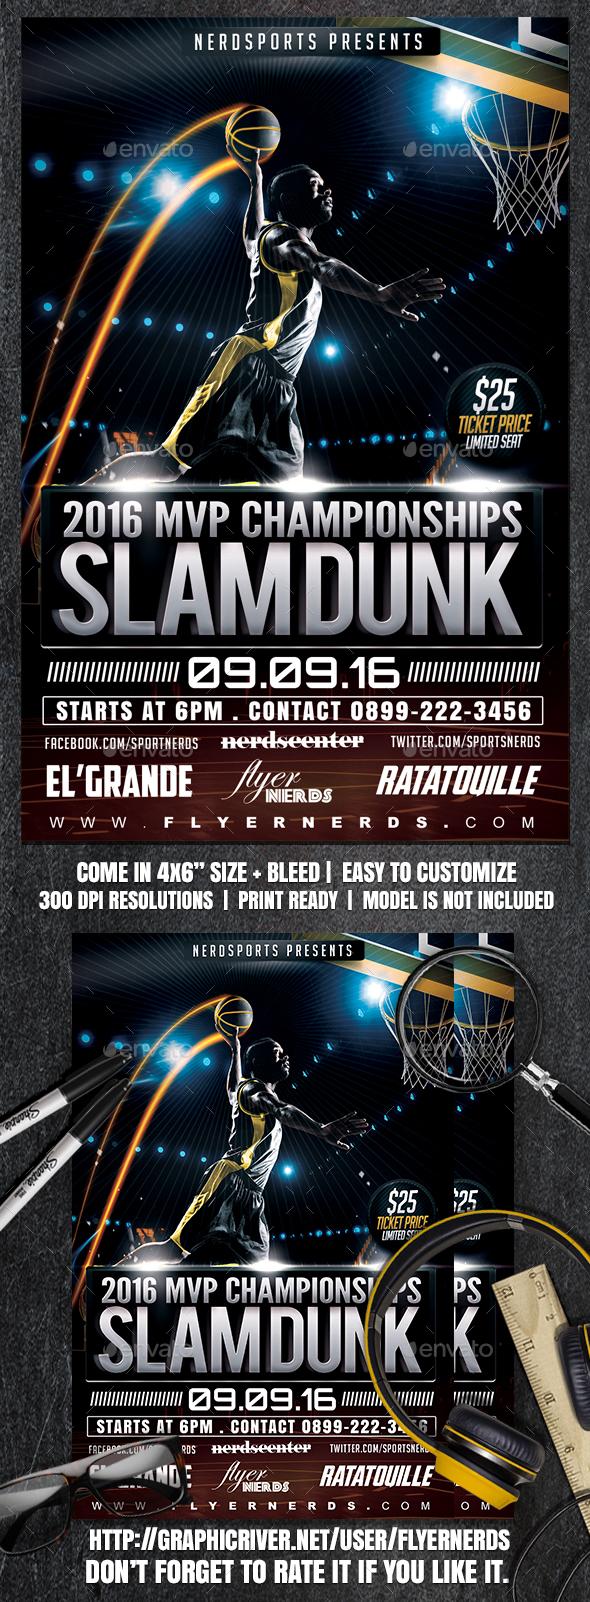 2016 MVP Championships Slamdunk Sports Flyer - Sports Events